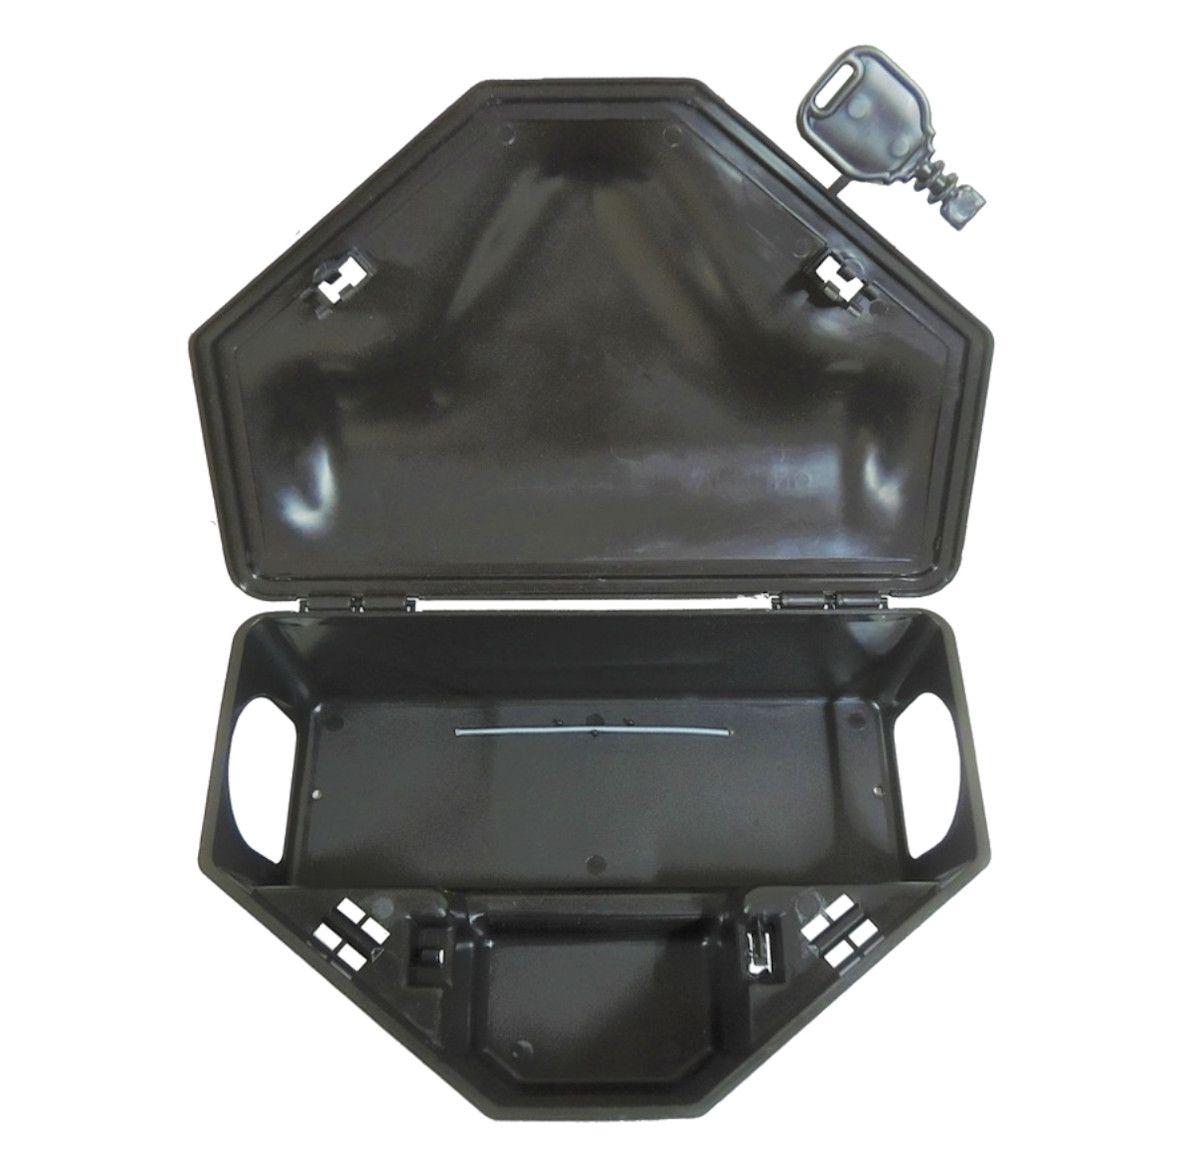 Kit 57 Porta Isca Com 2 Chaves - Duplo Travamento